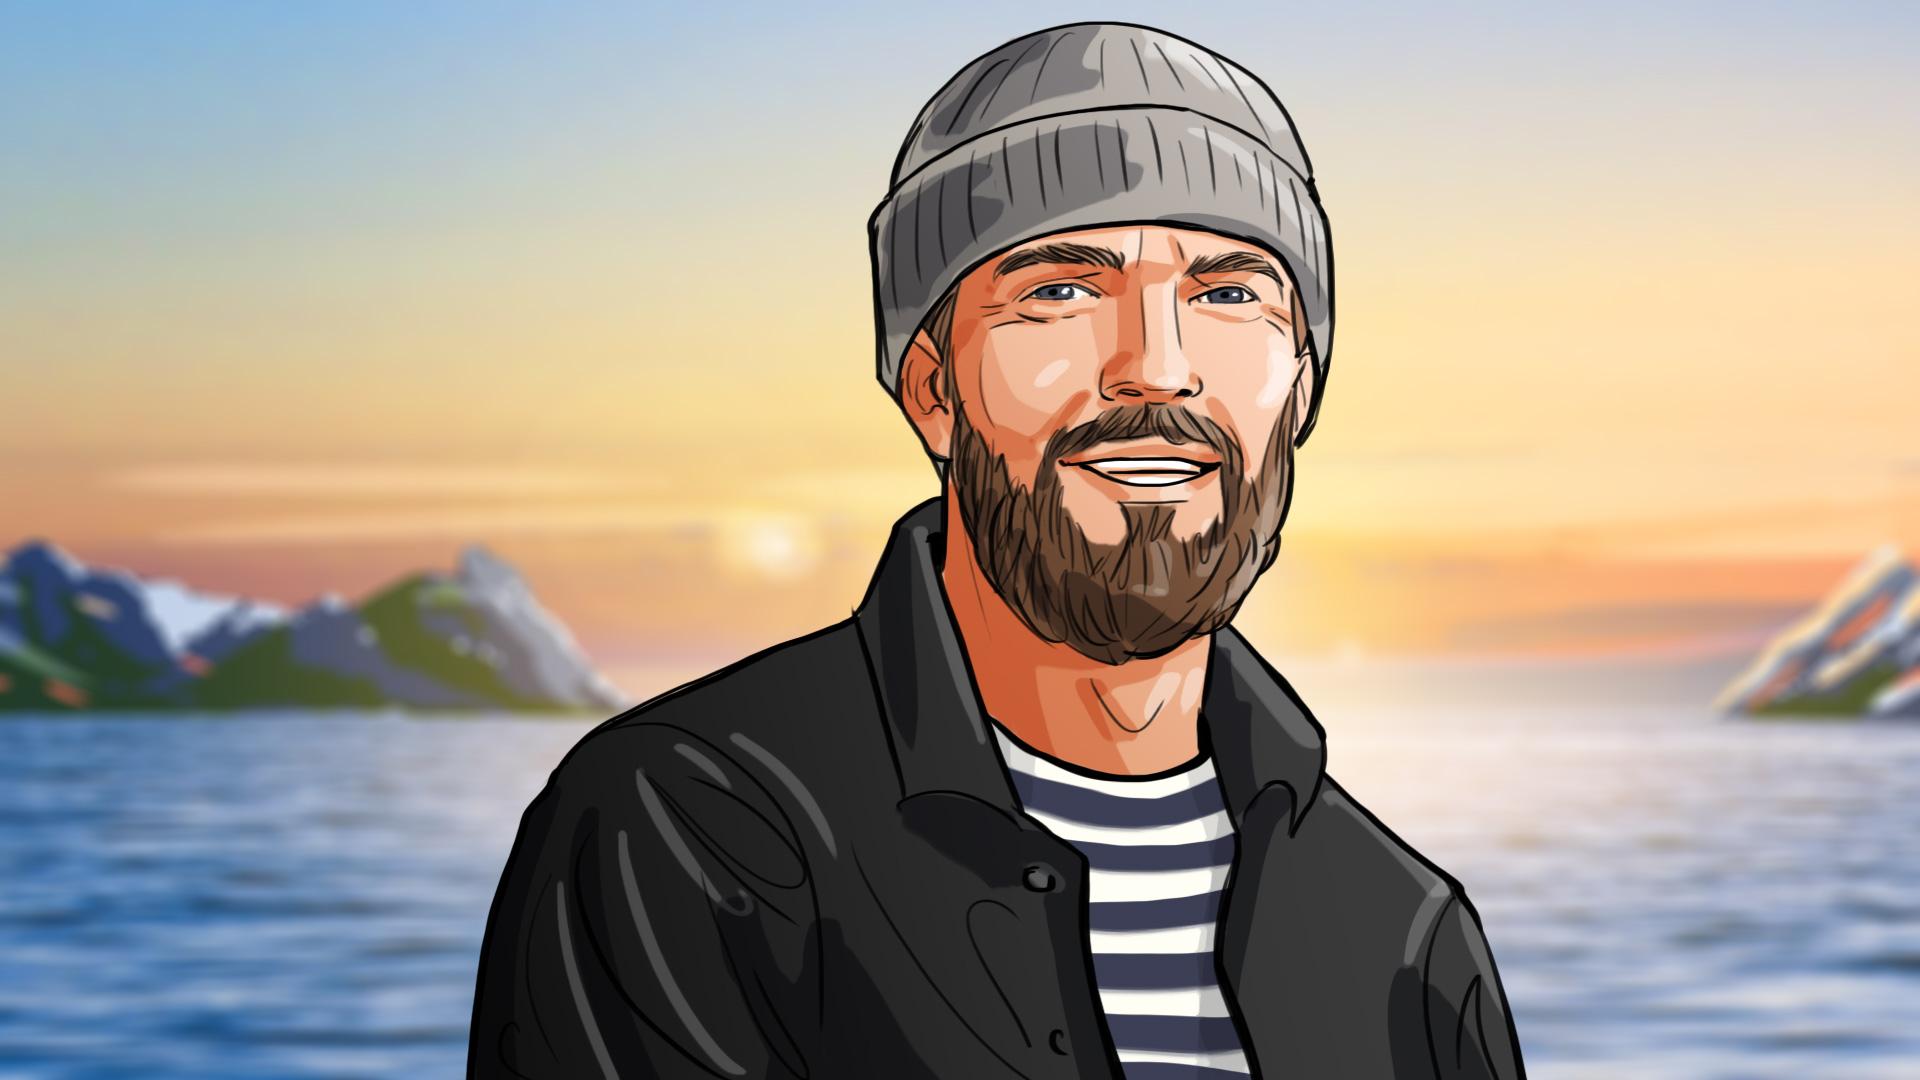 illustration man fisher seaman